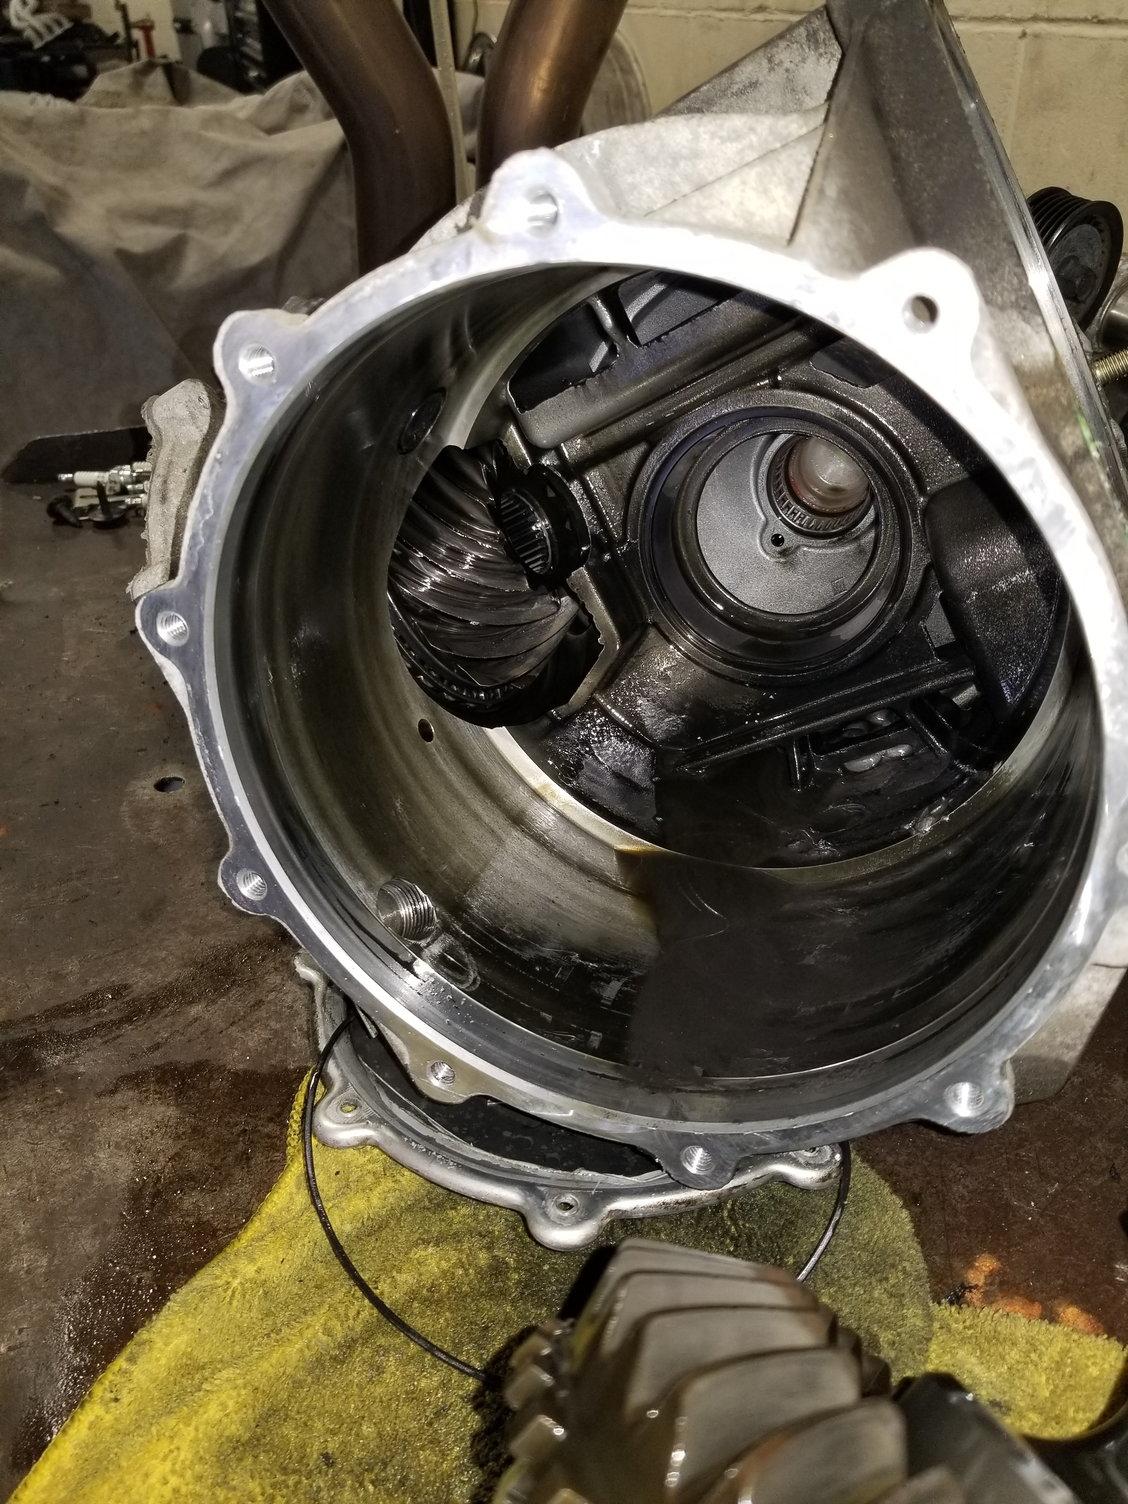 2003 Manual Transmission loud whine - CorvetteForum - Chevrolet